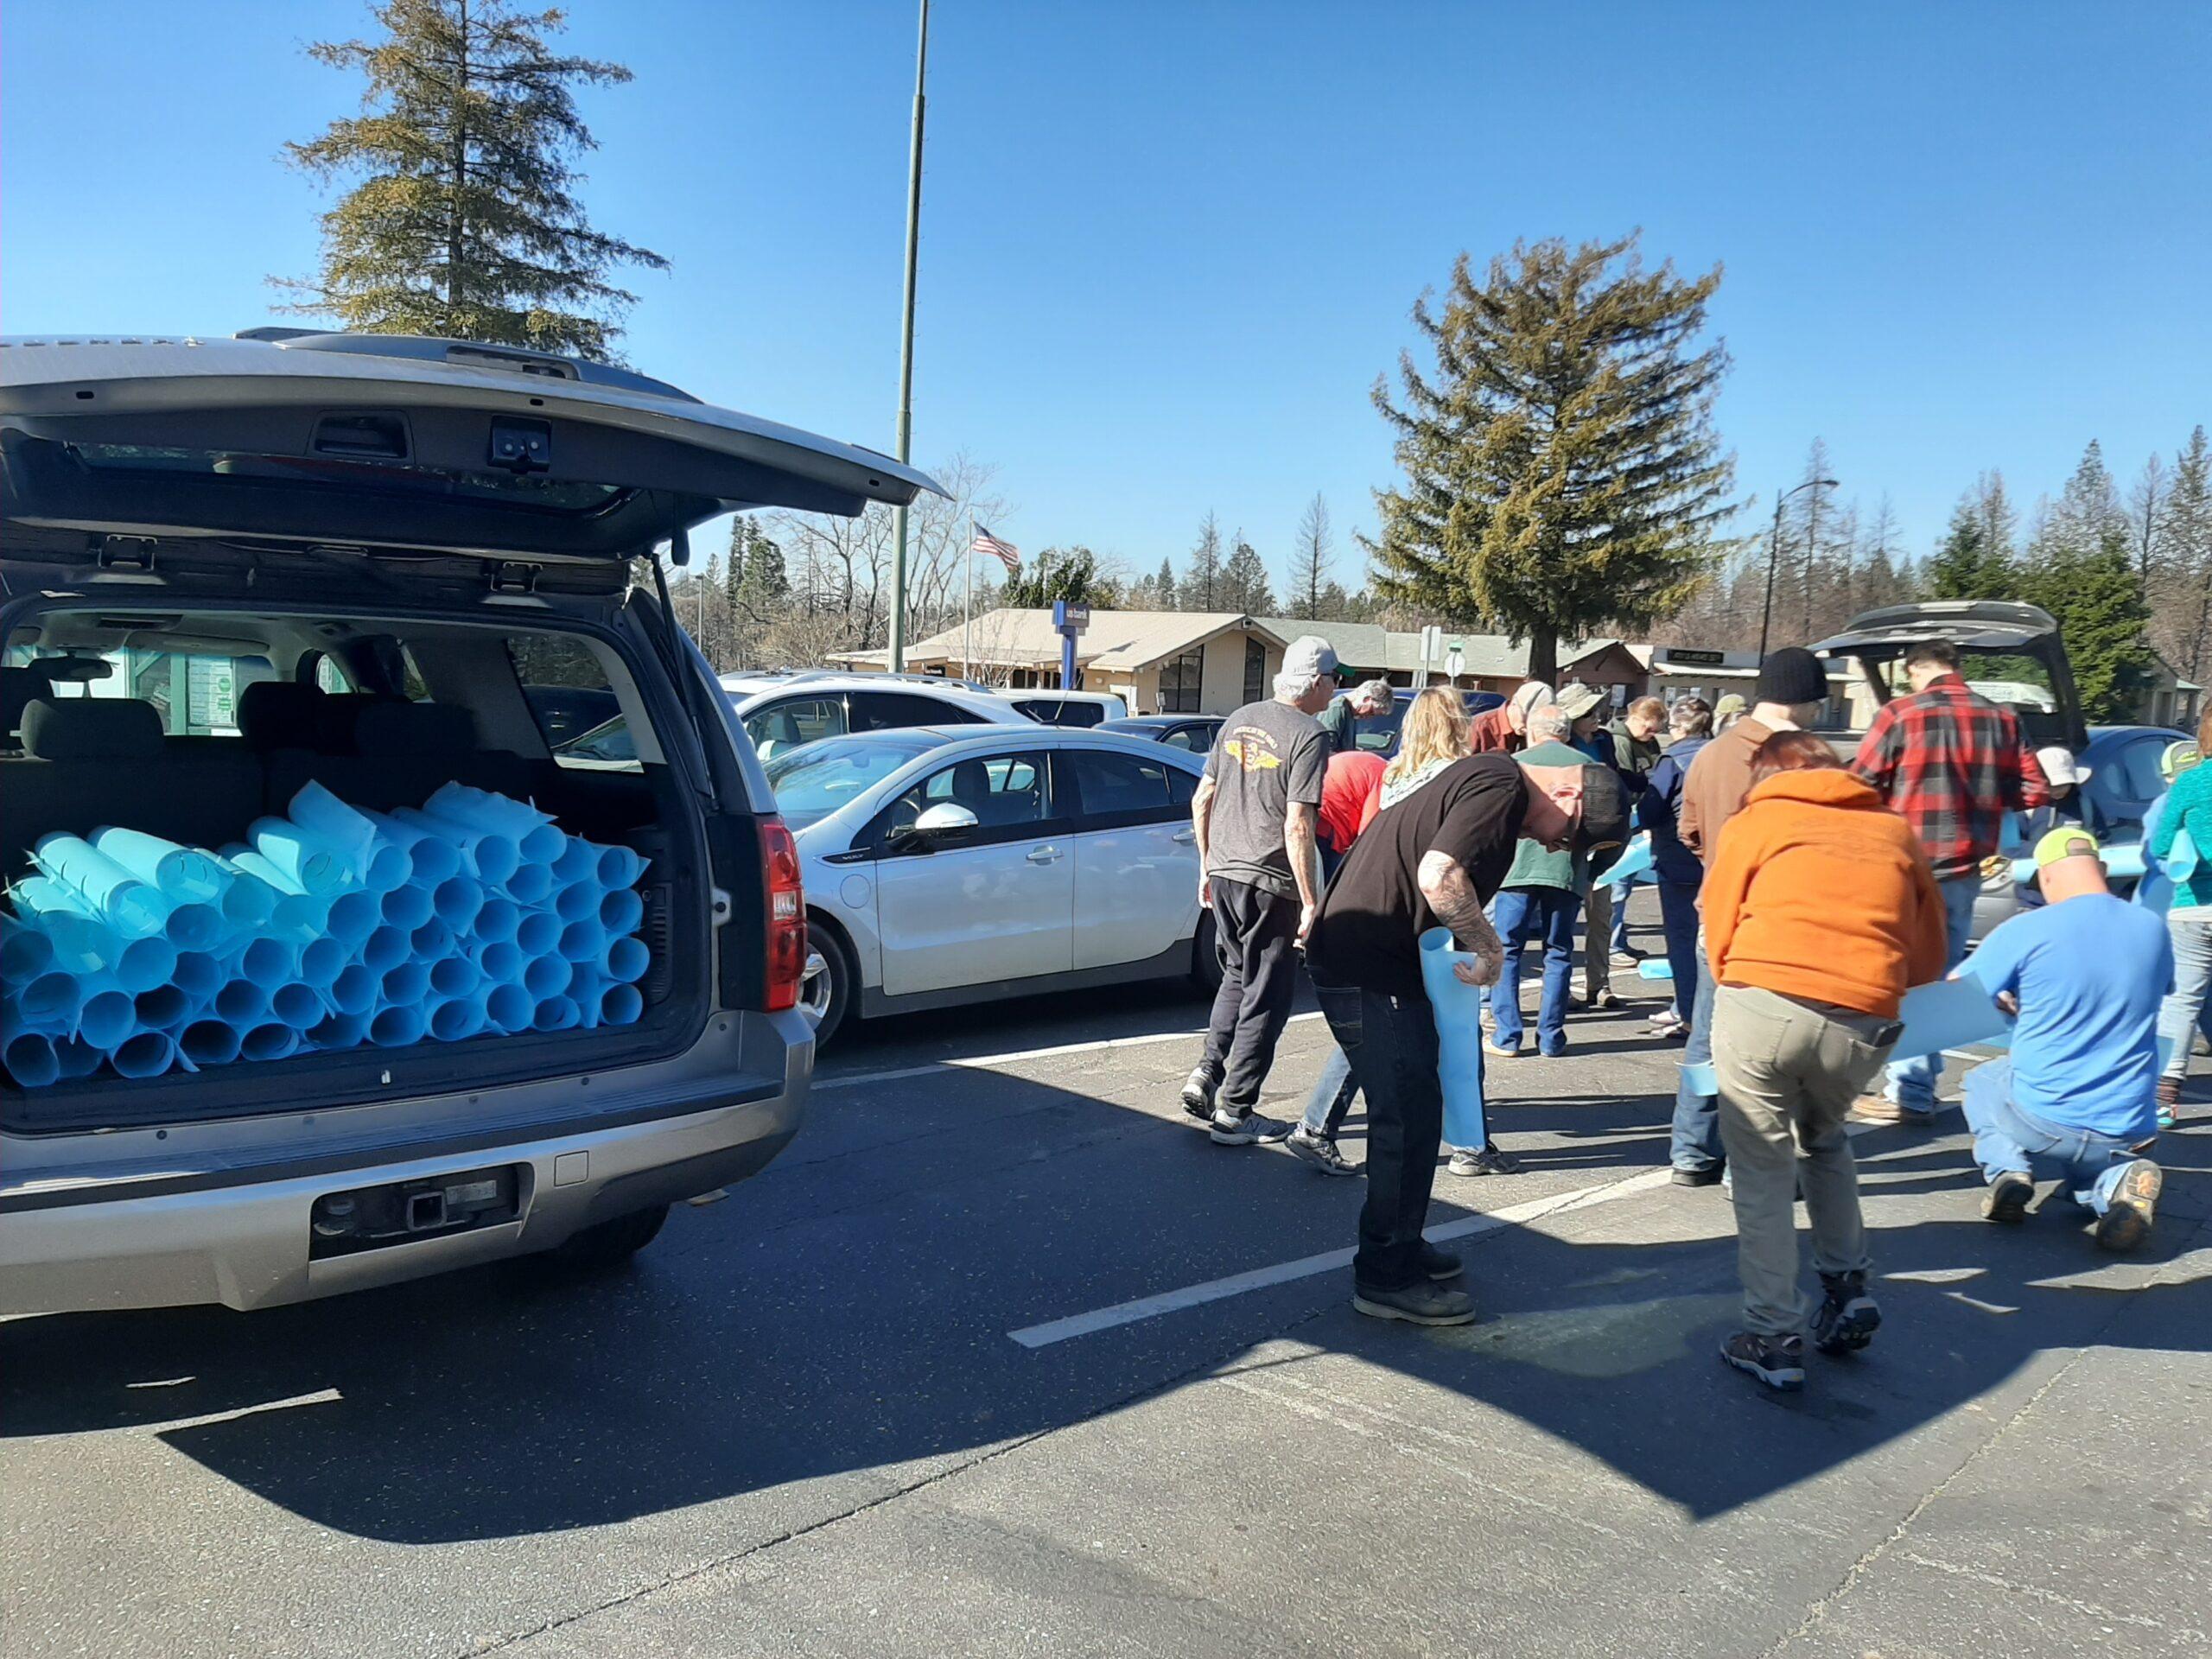 Volunteers in parking lot standing next to pile of tree protectors